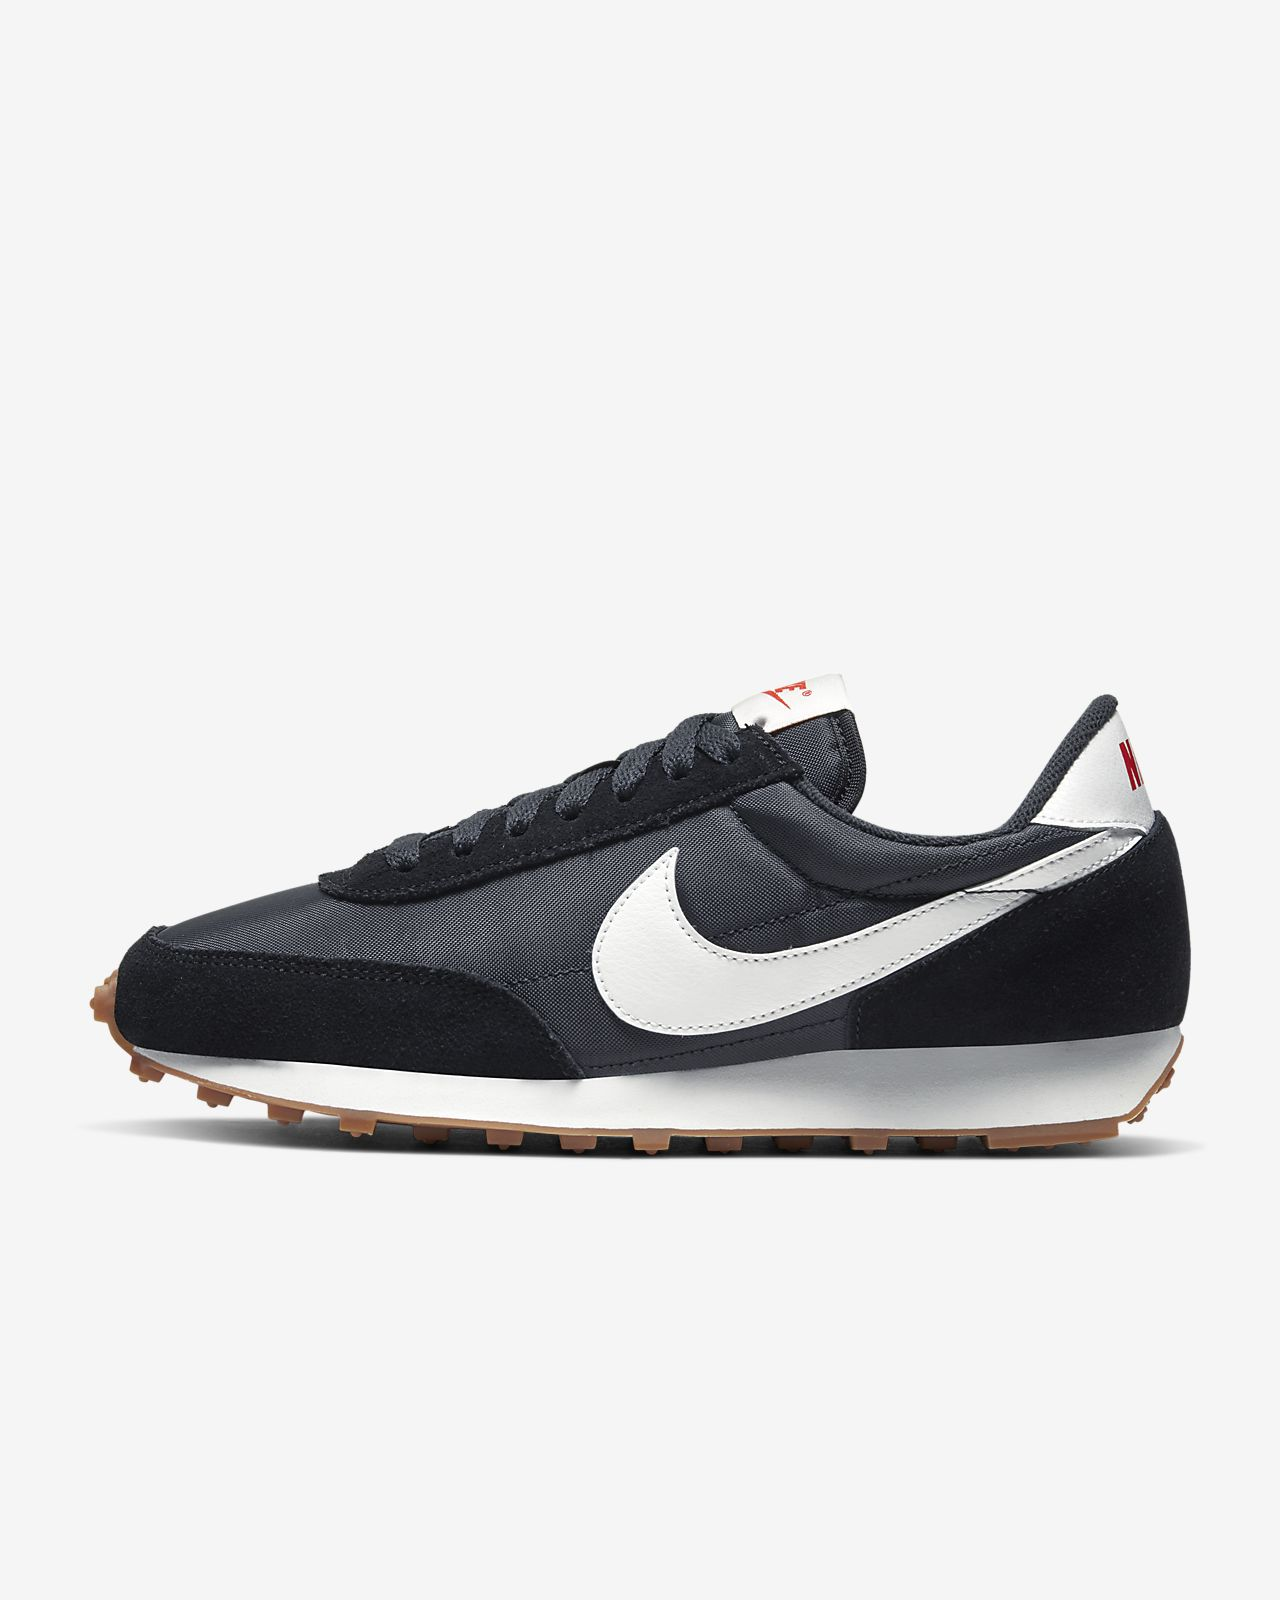 Sapatilhas Casual Nike Mulher Loja Online Portugal |